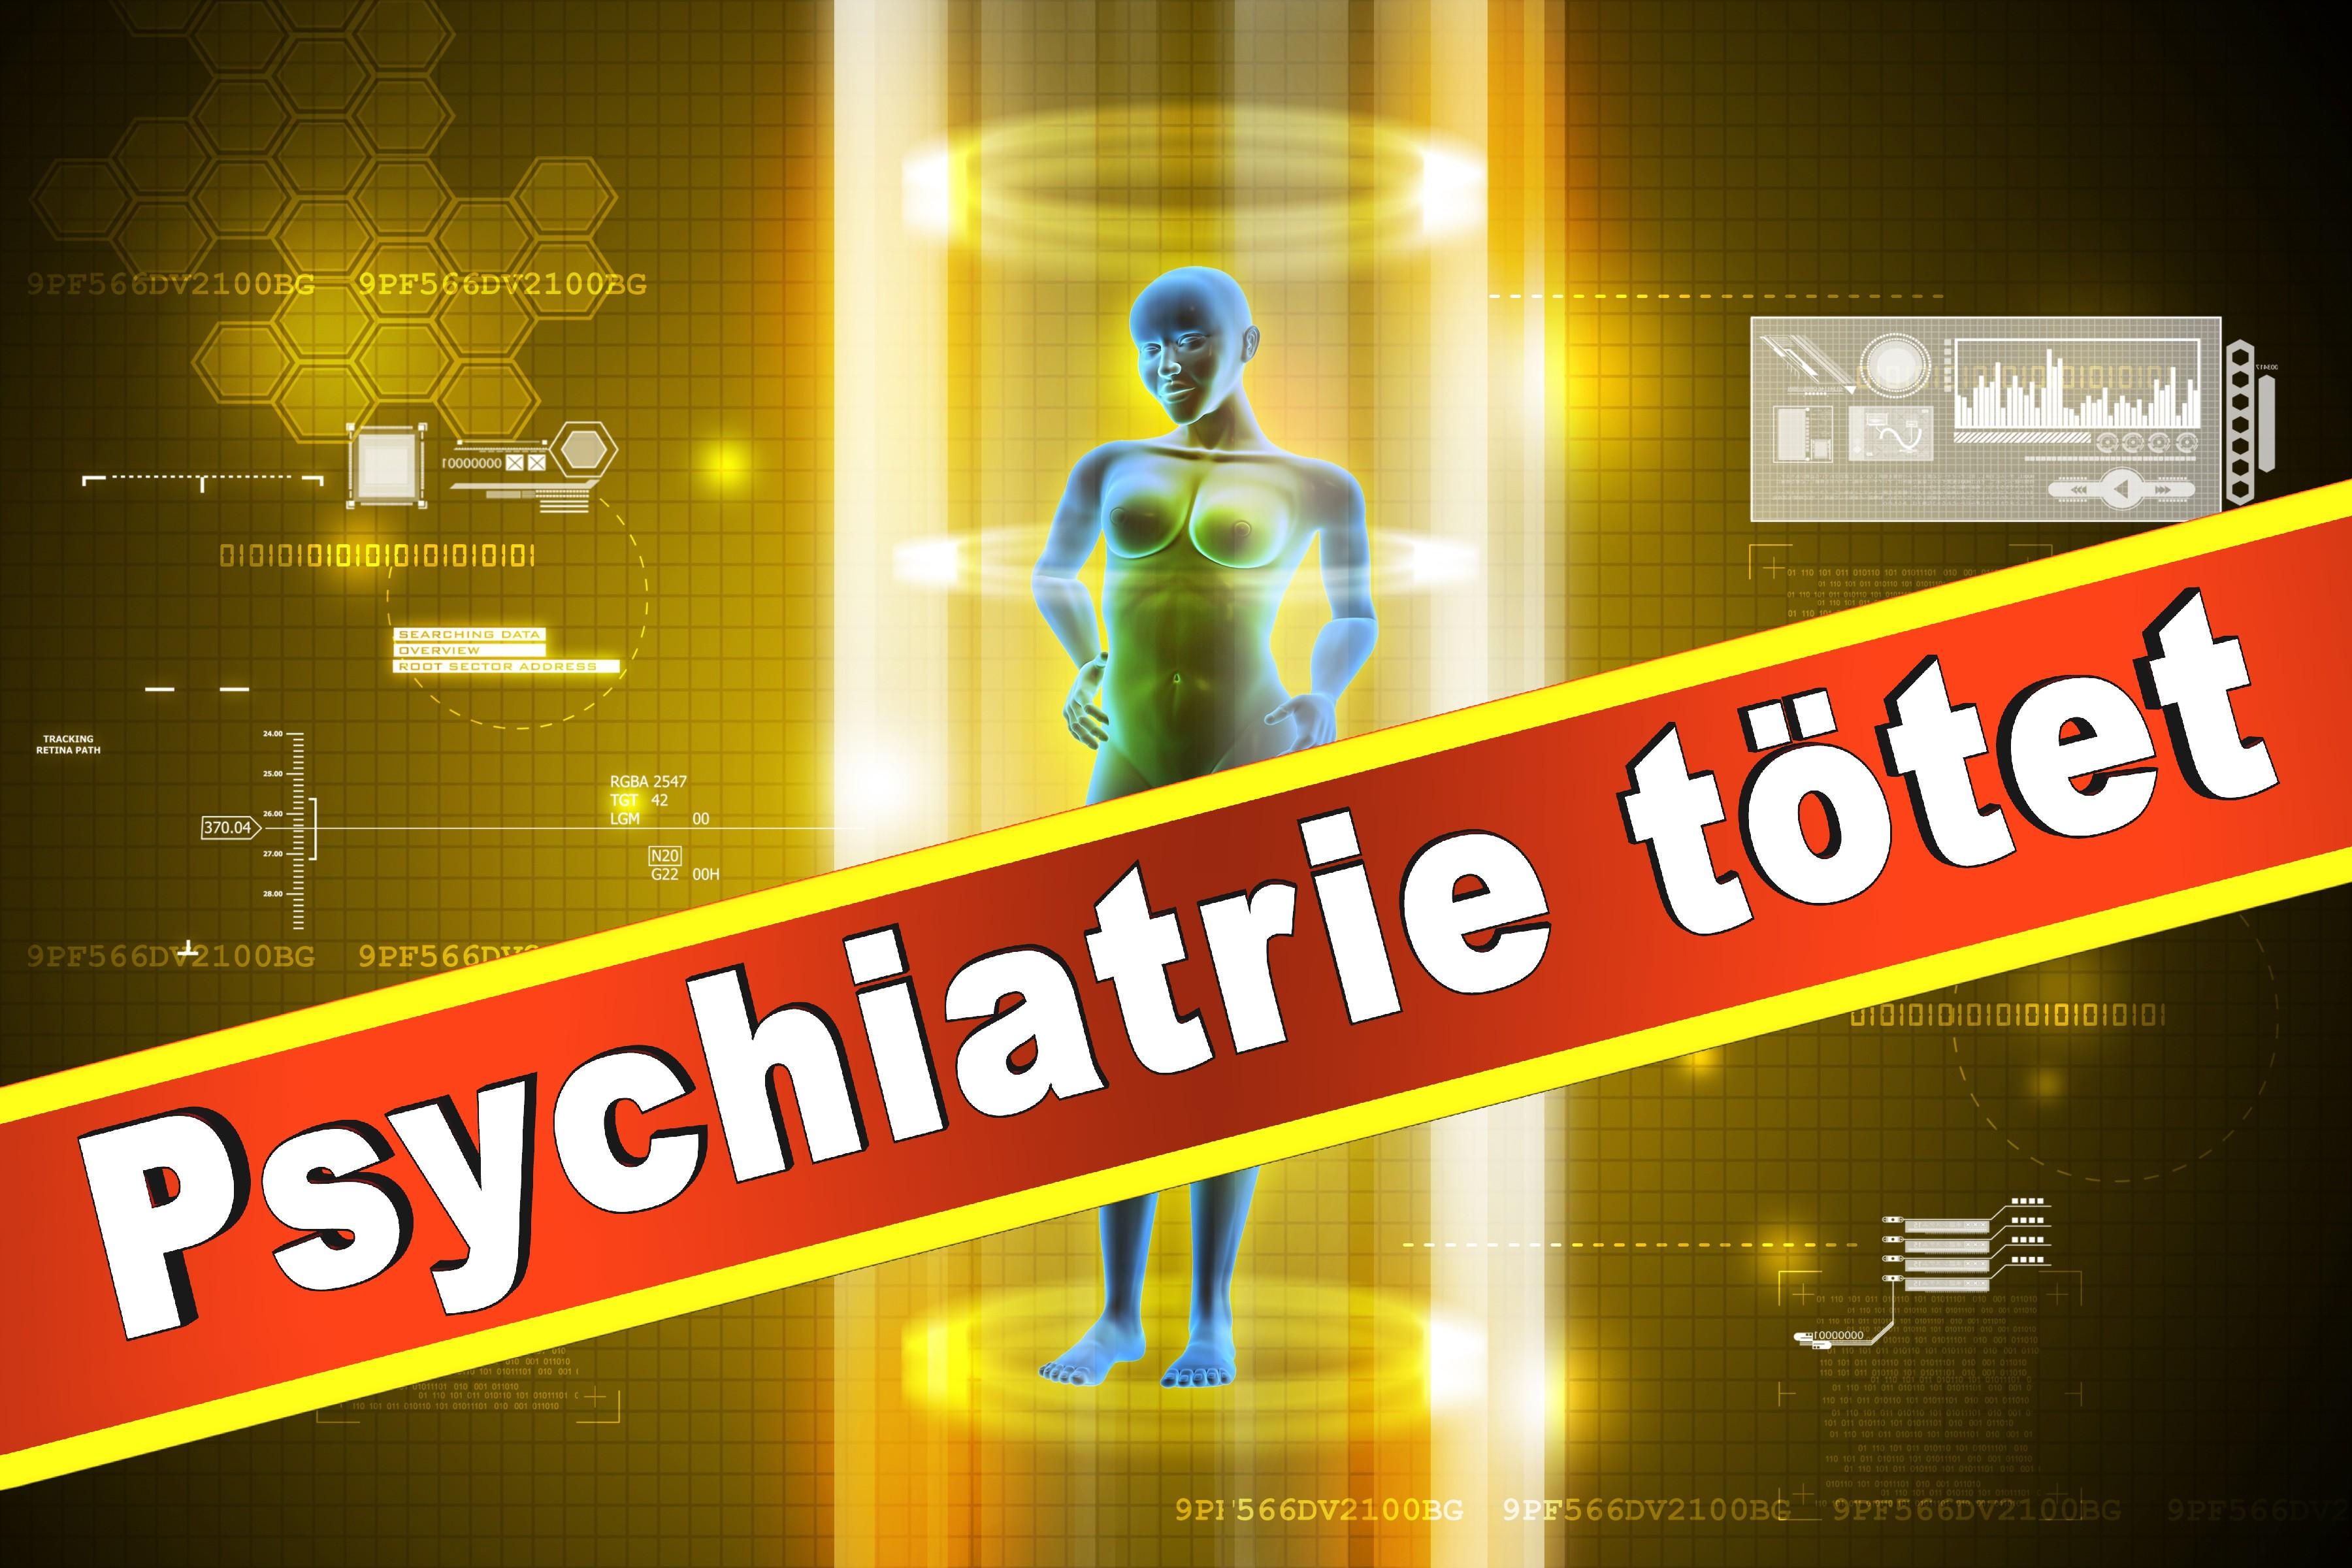 Danuta Maria Fuchs Arzt Hannover Gutachten Psychiater Facharzt Psychiatrie